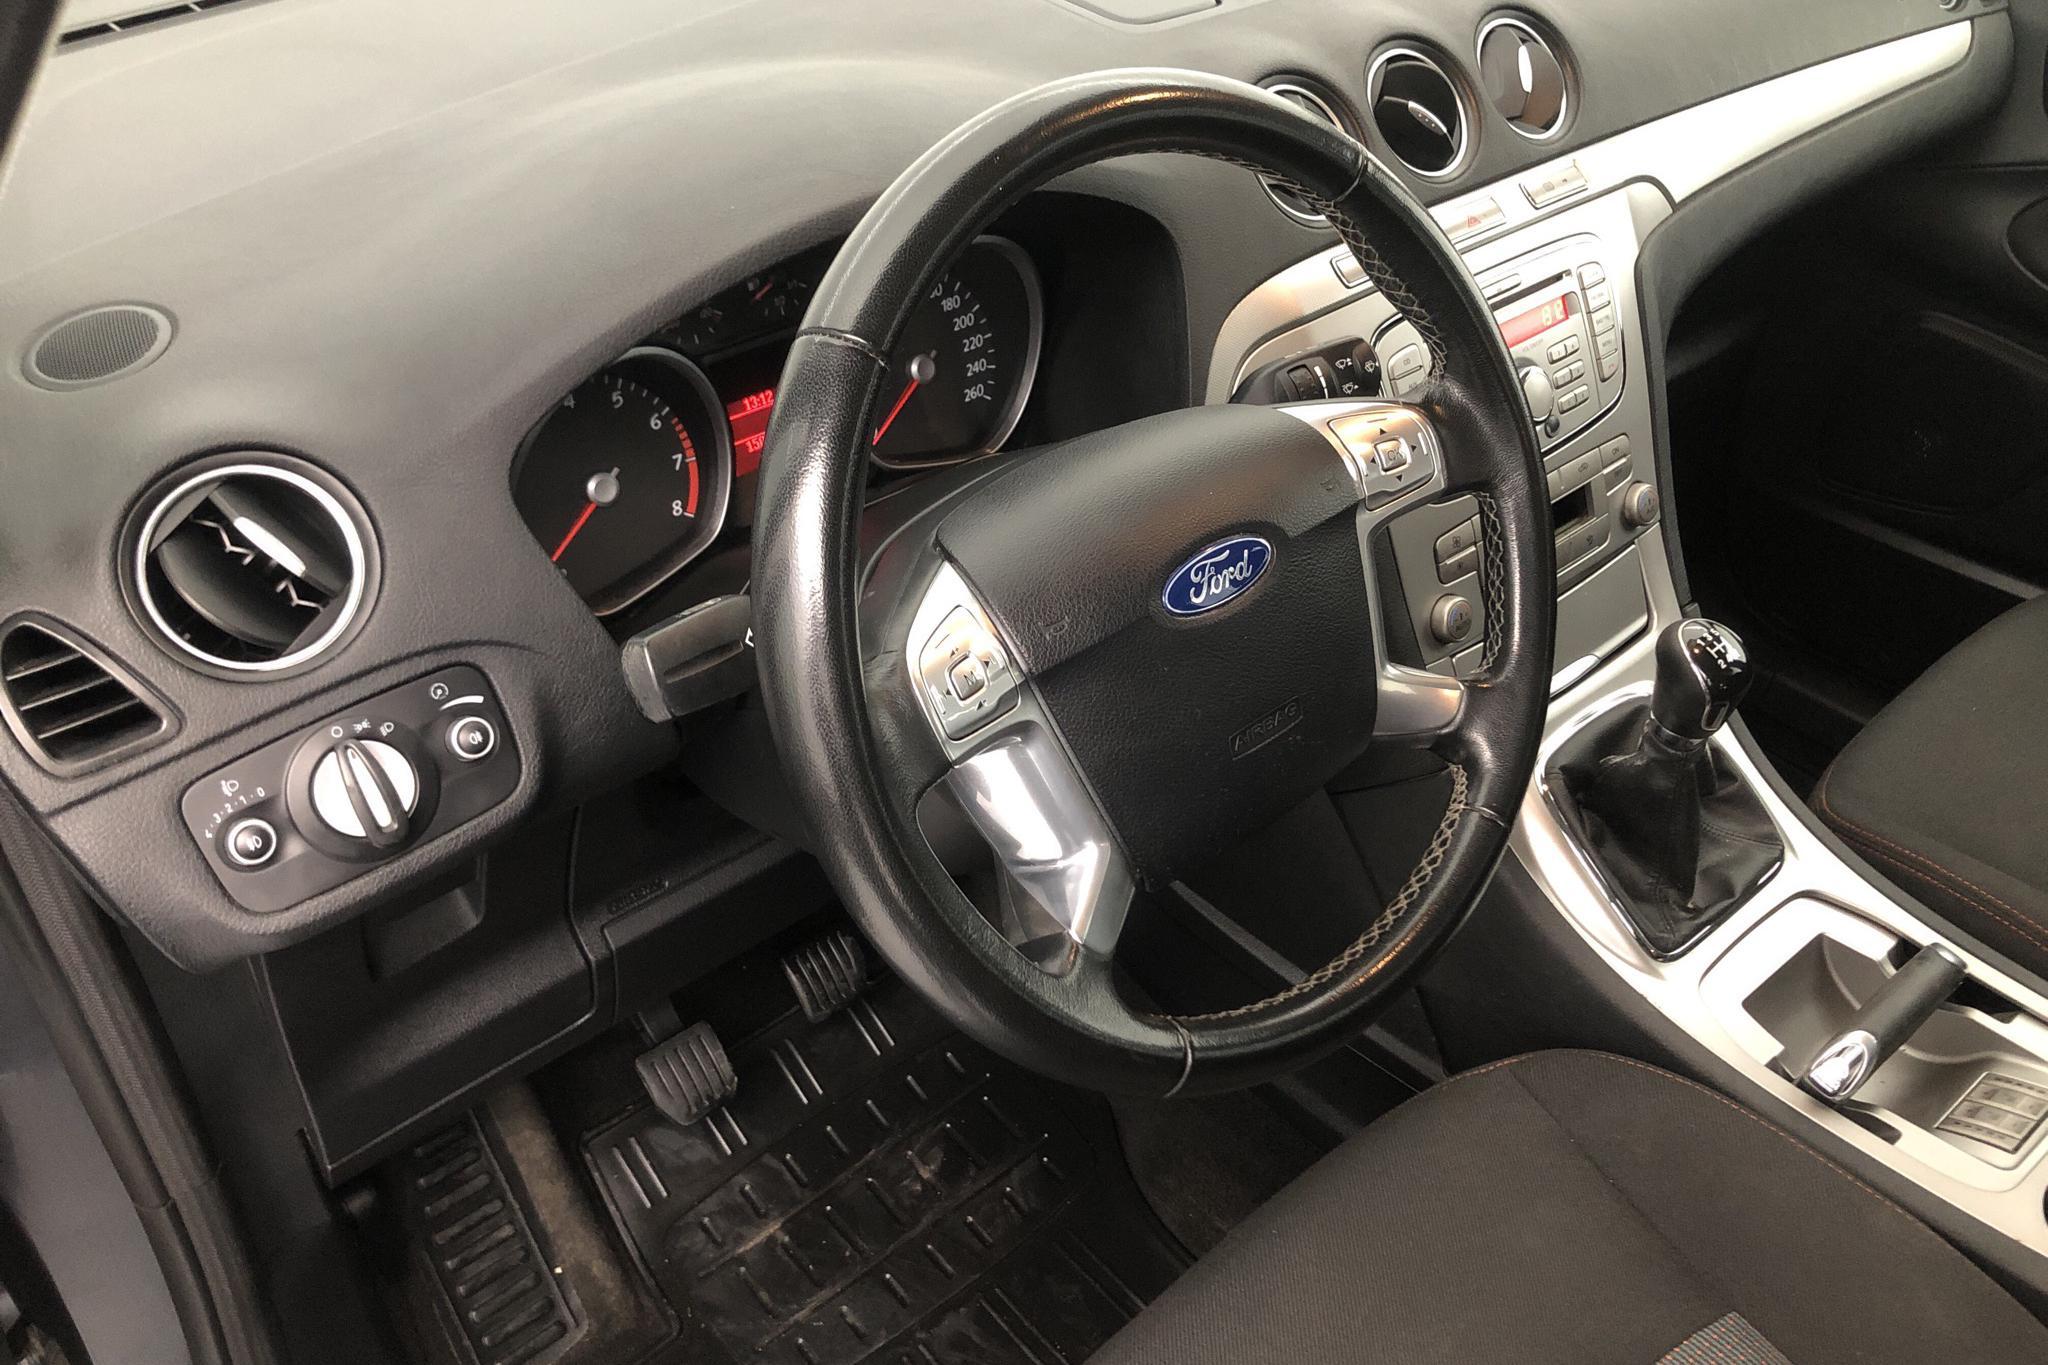 Ford Galaxy 2.0 Flexifuel (145hk) - 150 030 km - Manual - gray - 2010